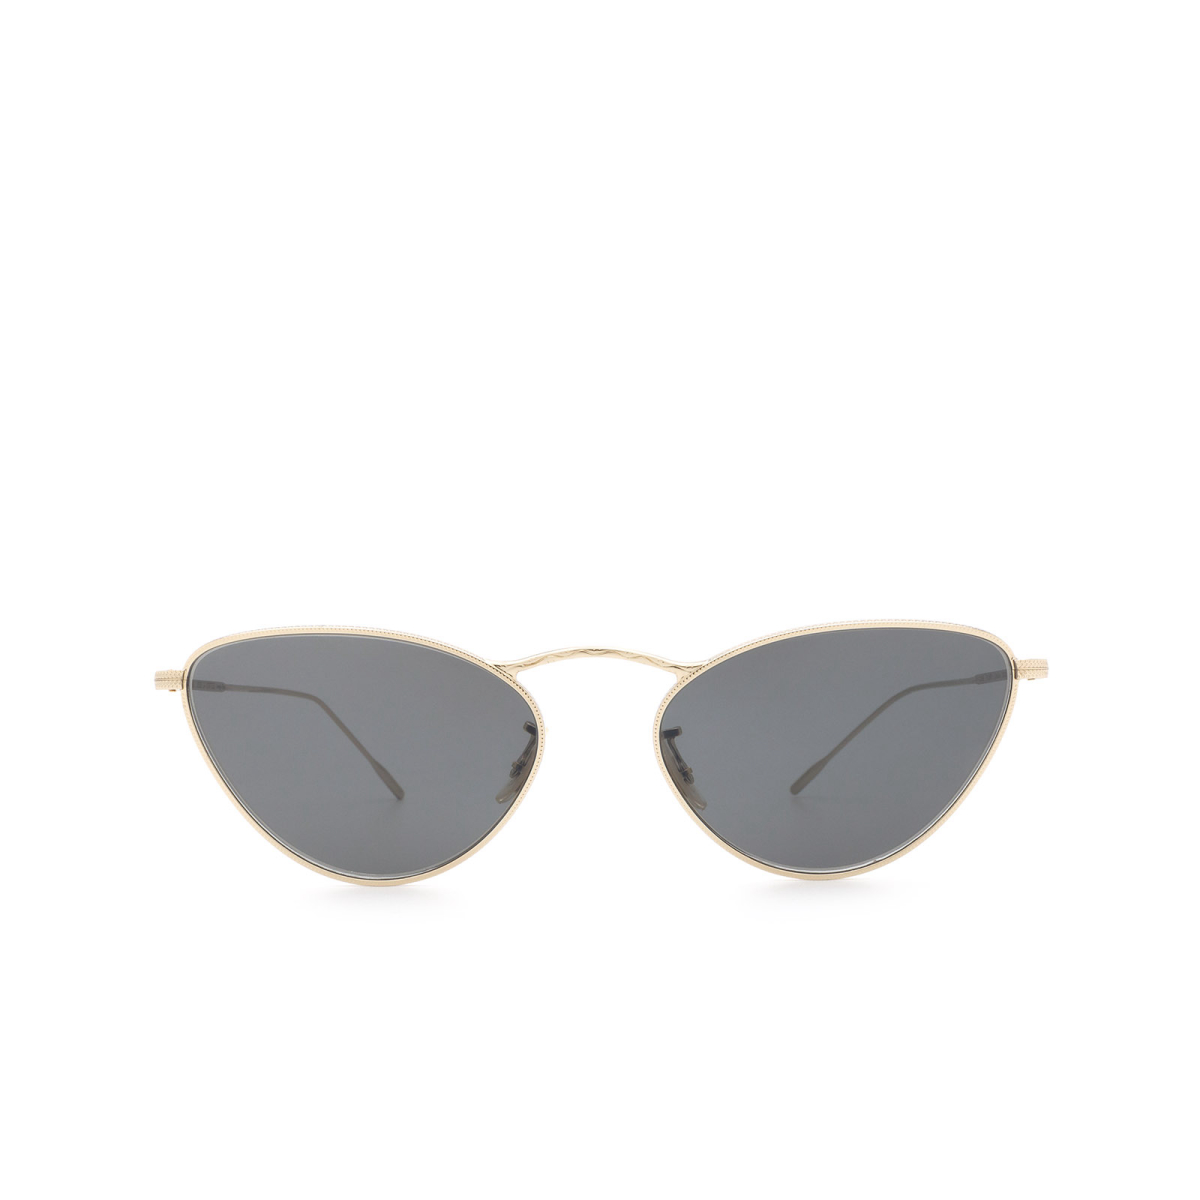 Oliver Peoples® Cat-eye Sunglasses: Lelaina OV1239S color 5035R5.